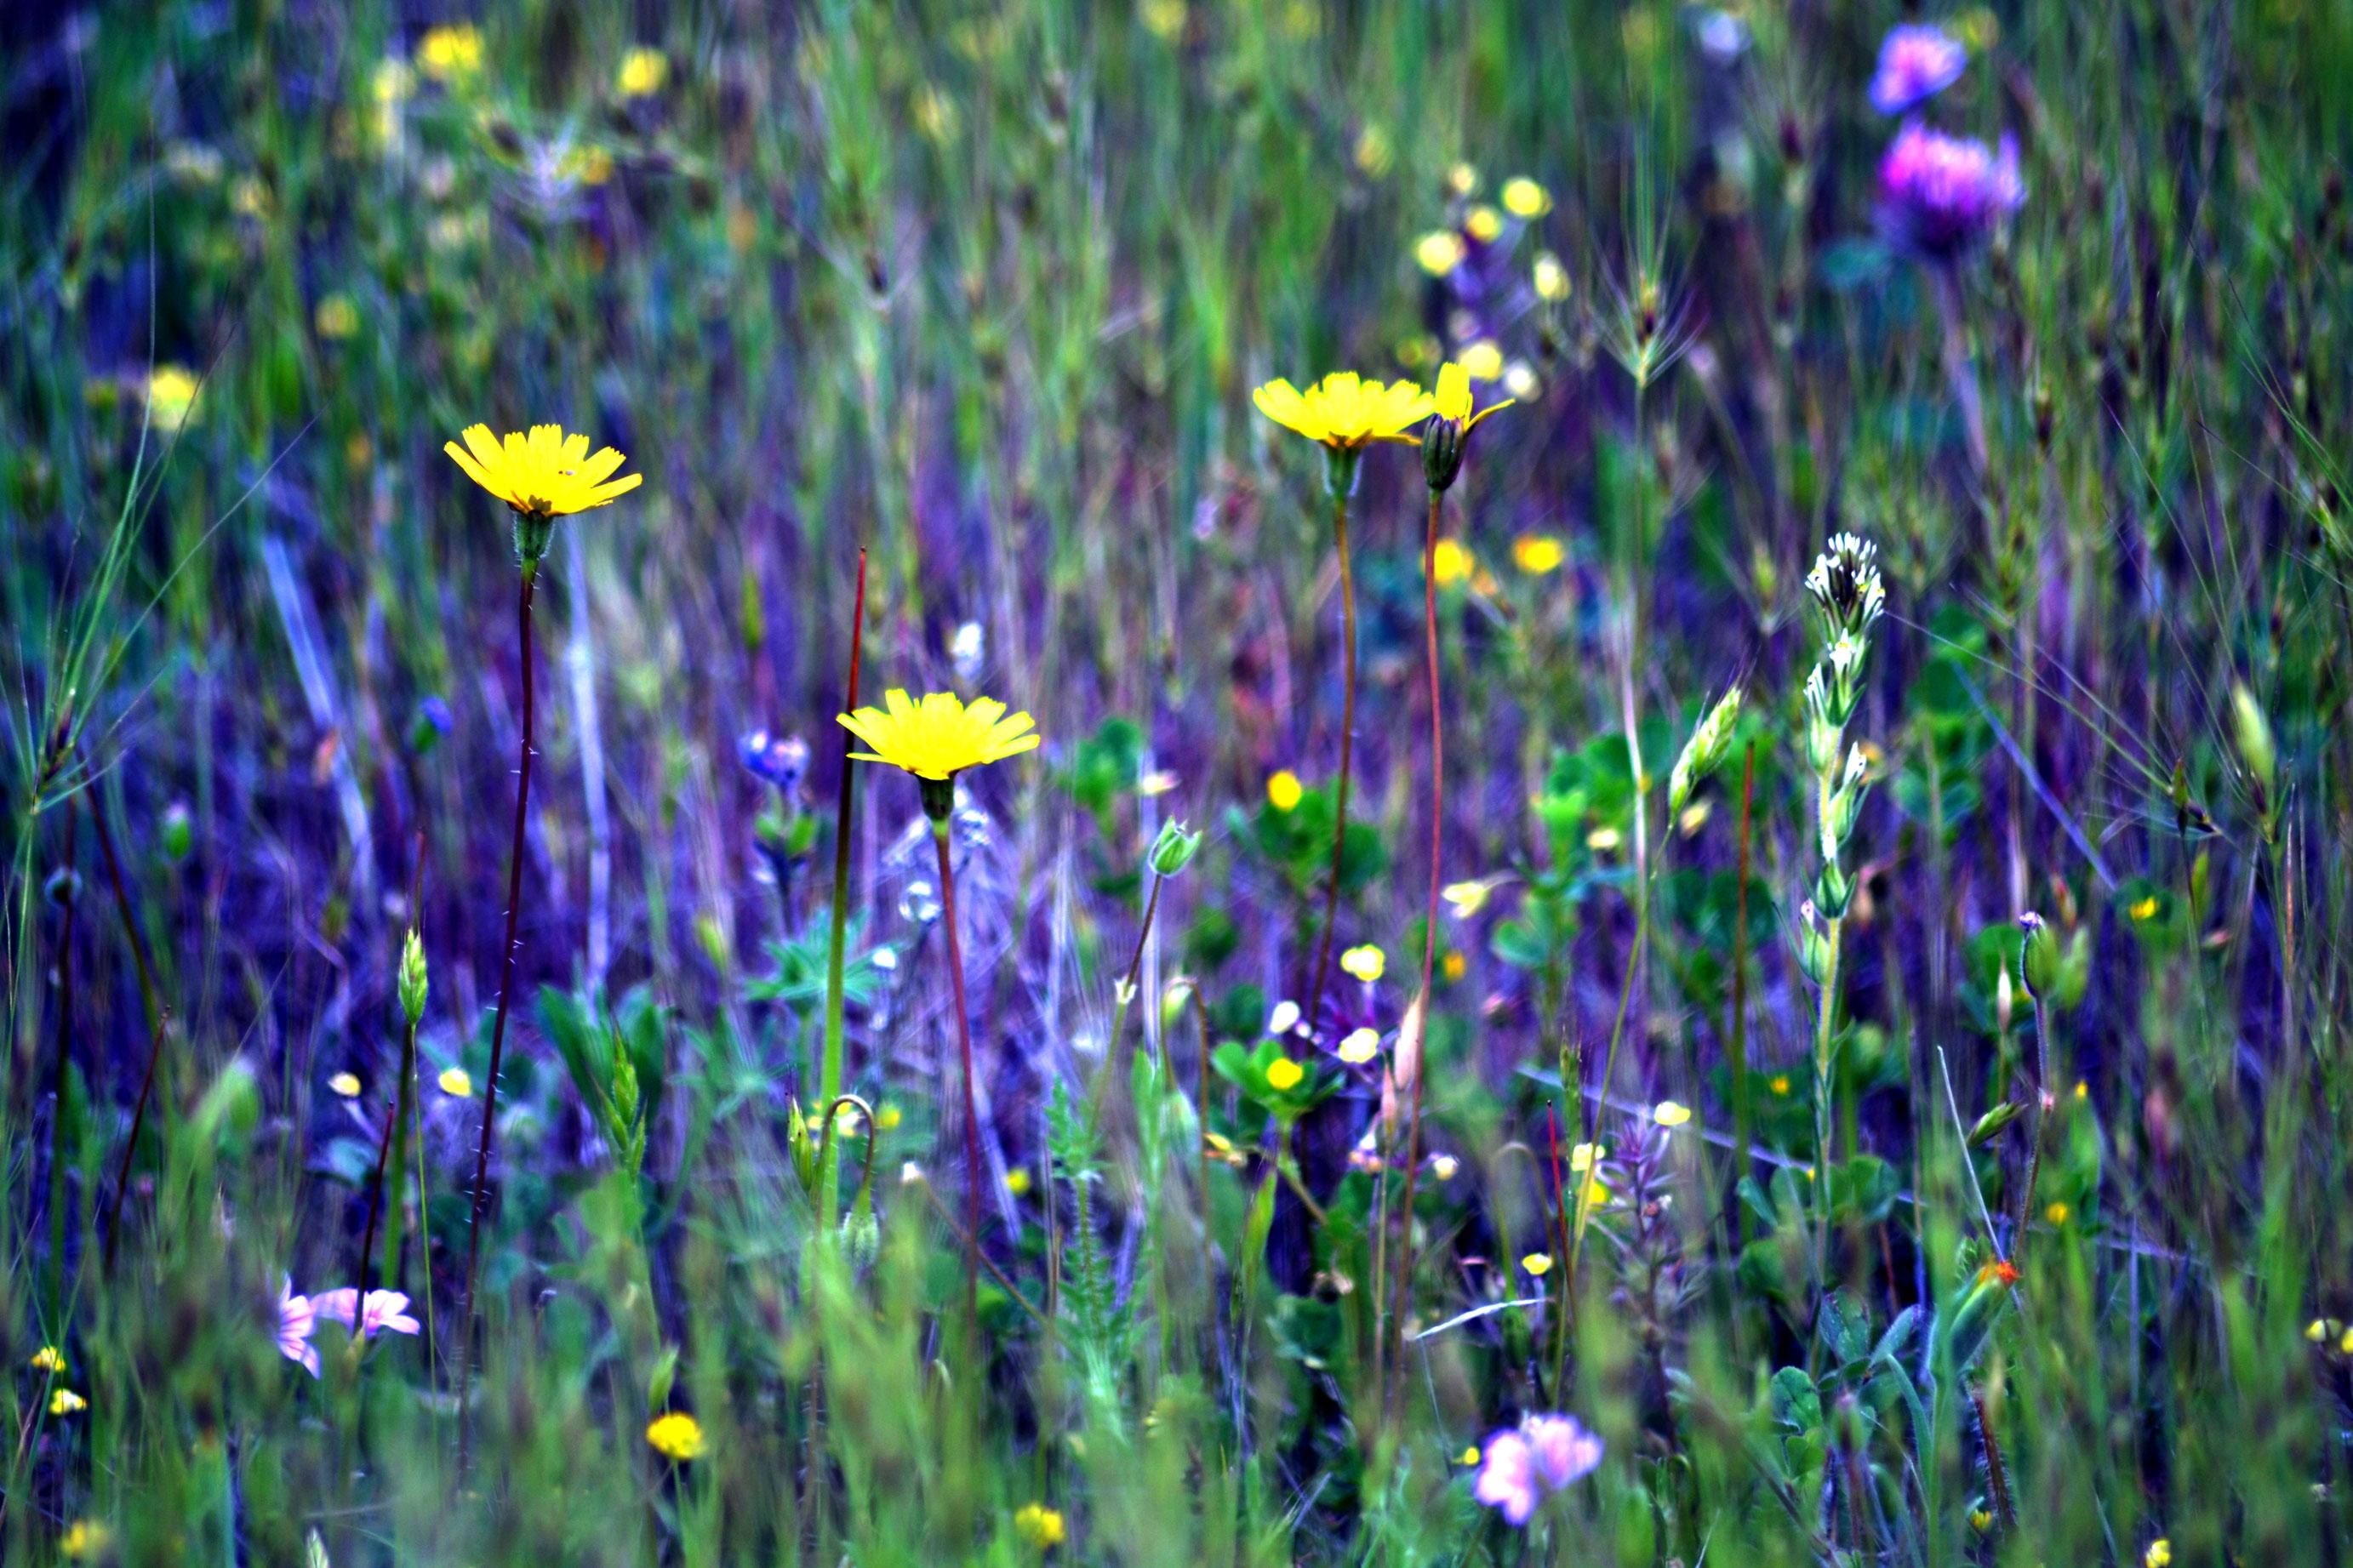 Flower gardens wallpaper - The Meadow Gardens For Goldens